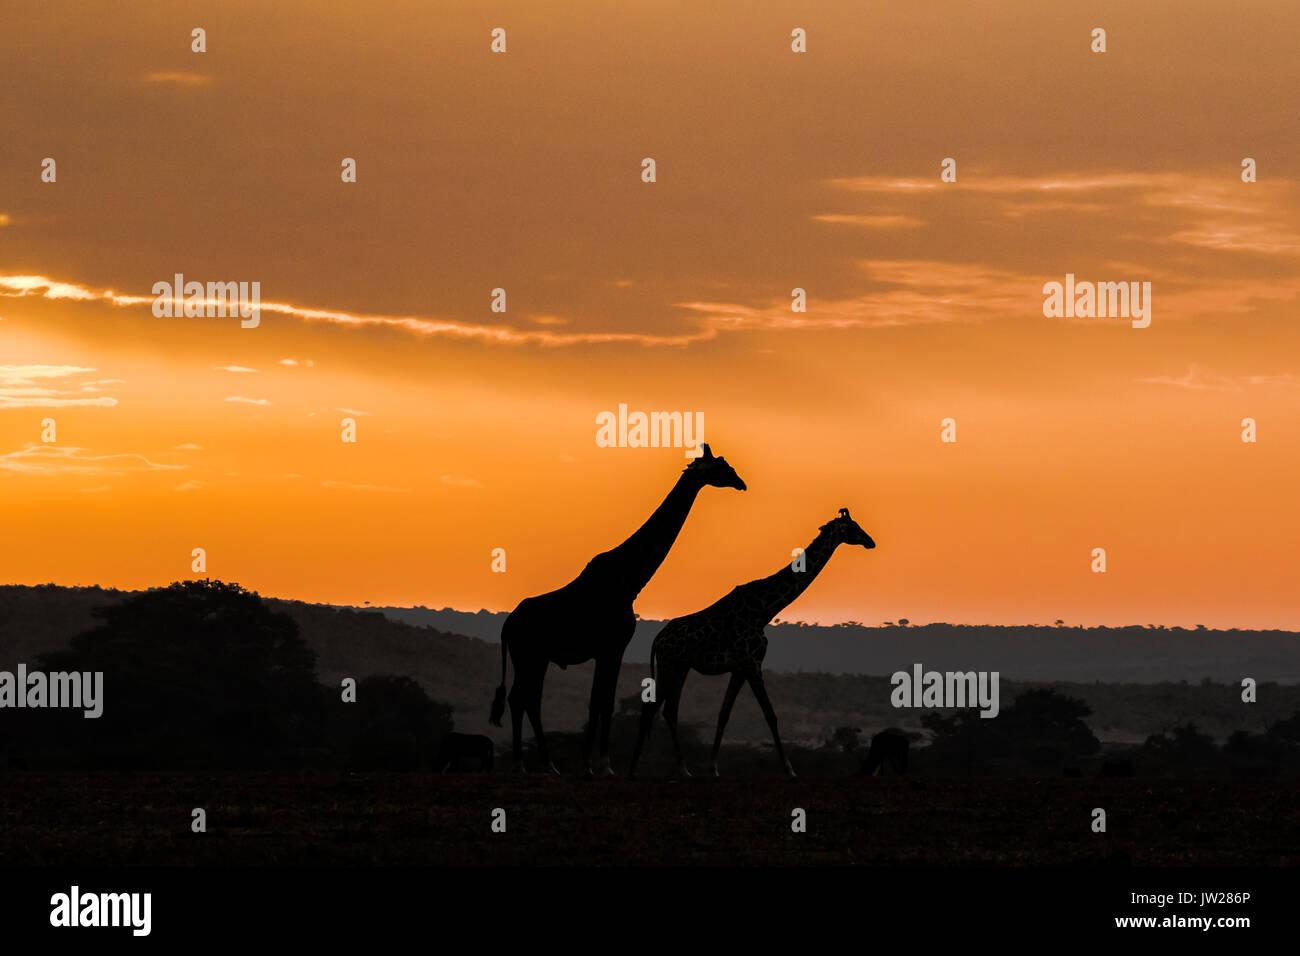 Masai Giraffe (Giraffa Camelopardalis tippelskirchi) mother and child on the savannah at sunrise Stock Photo